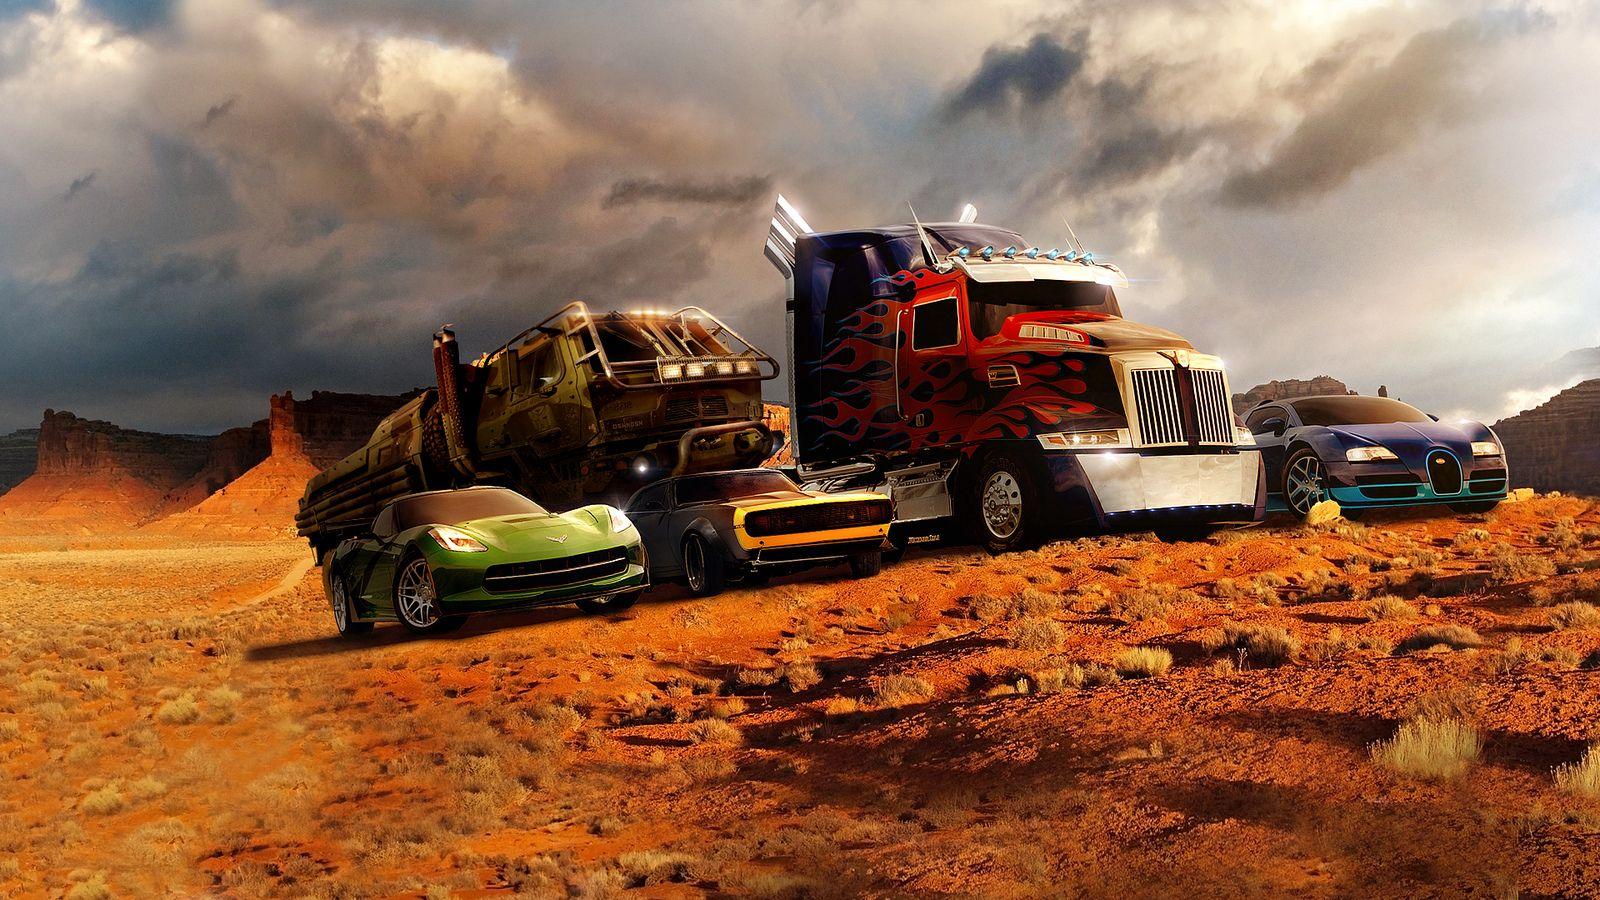 Transformers 4 Autobot Cars Dengan Gambar Transformers Movie